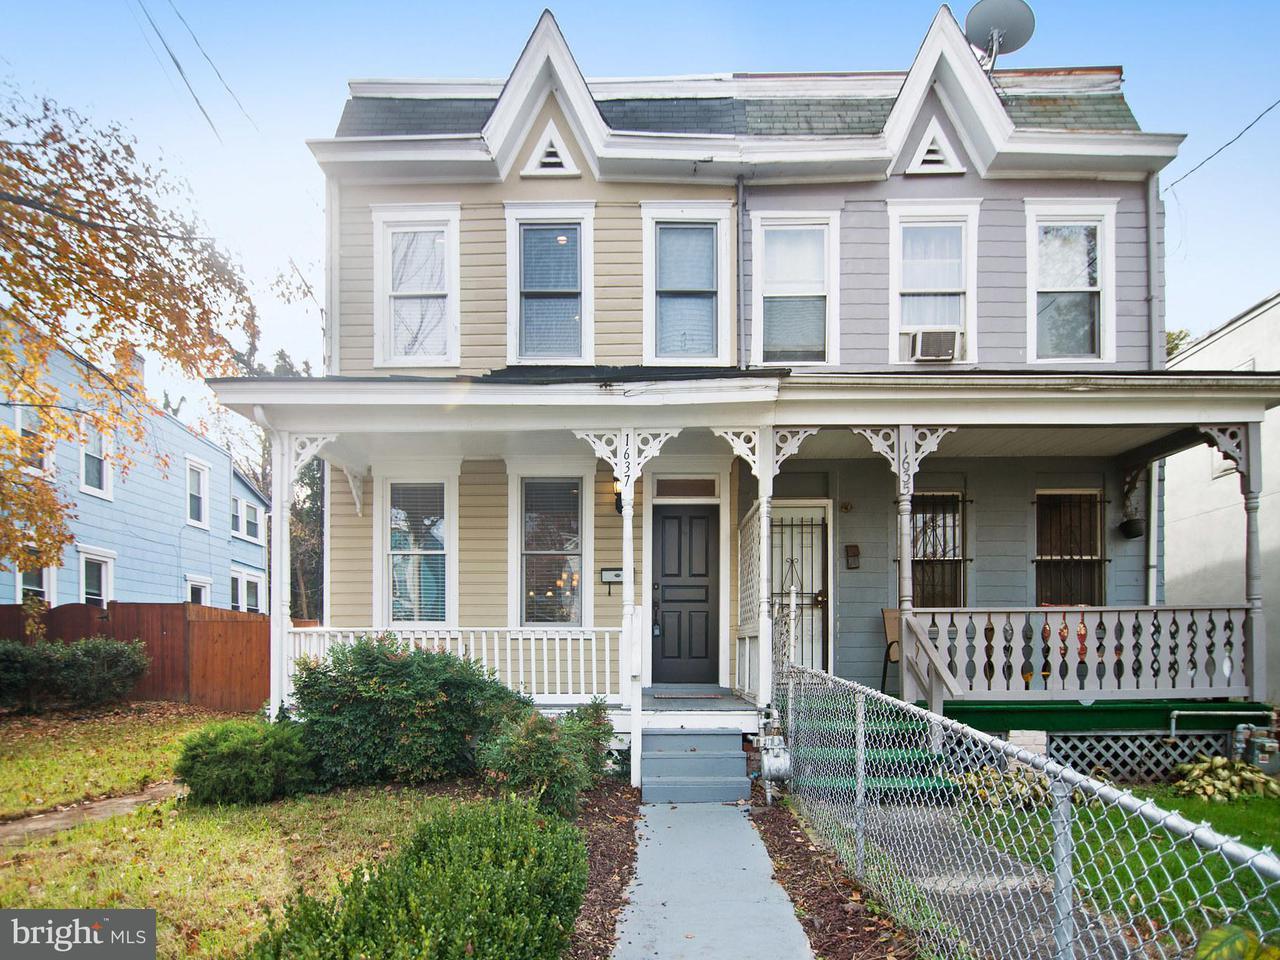 Townhouse for Sale at 1637 U ST SE 1637 U ST SE Washington, District Of Columbia 20020 United States